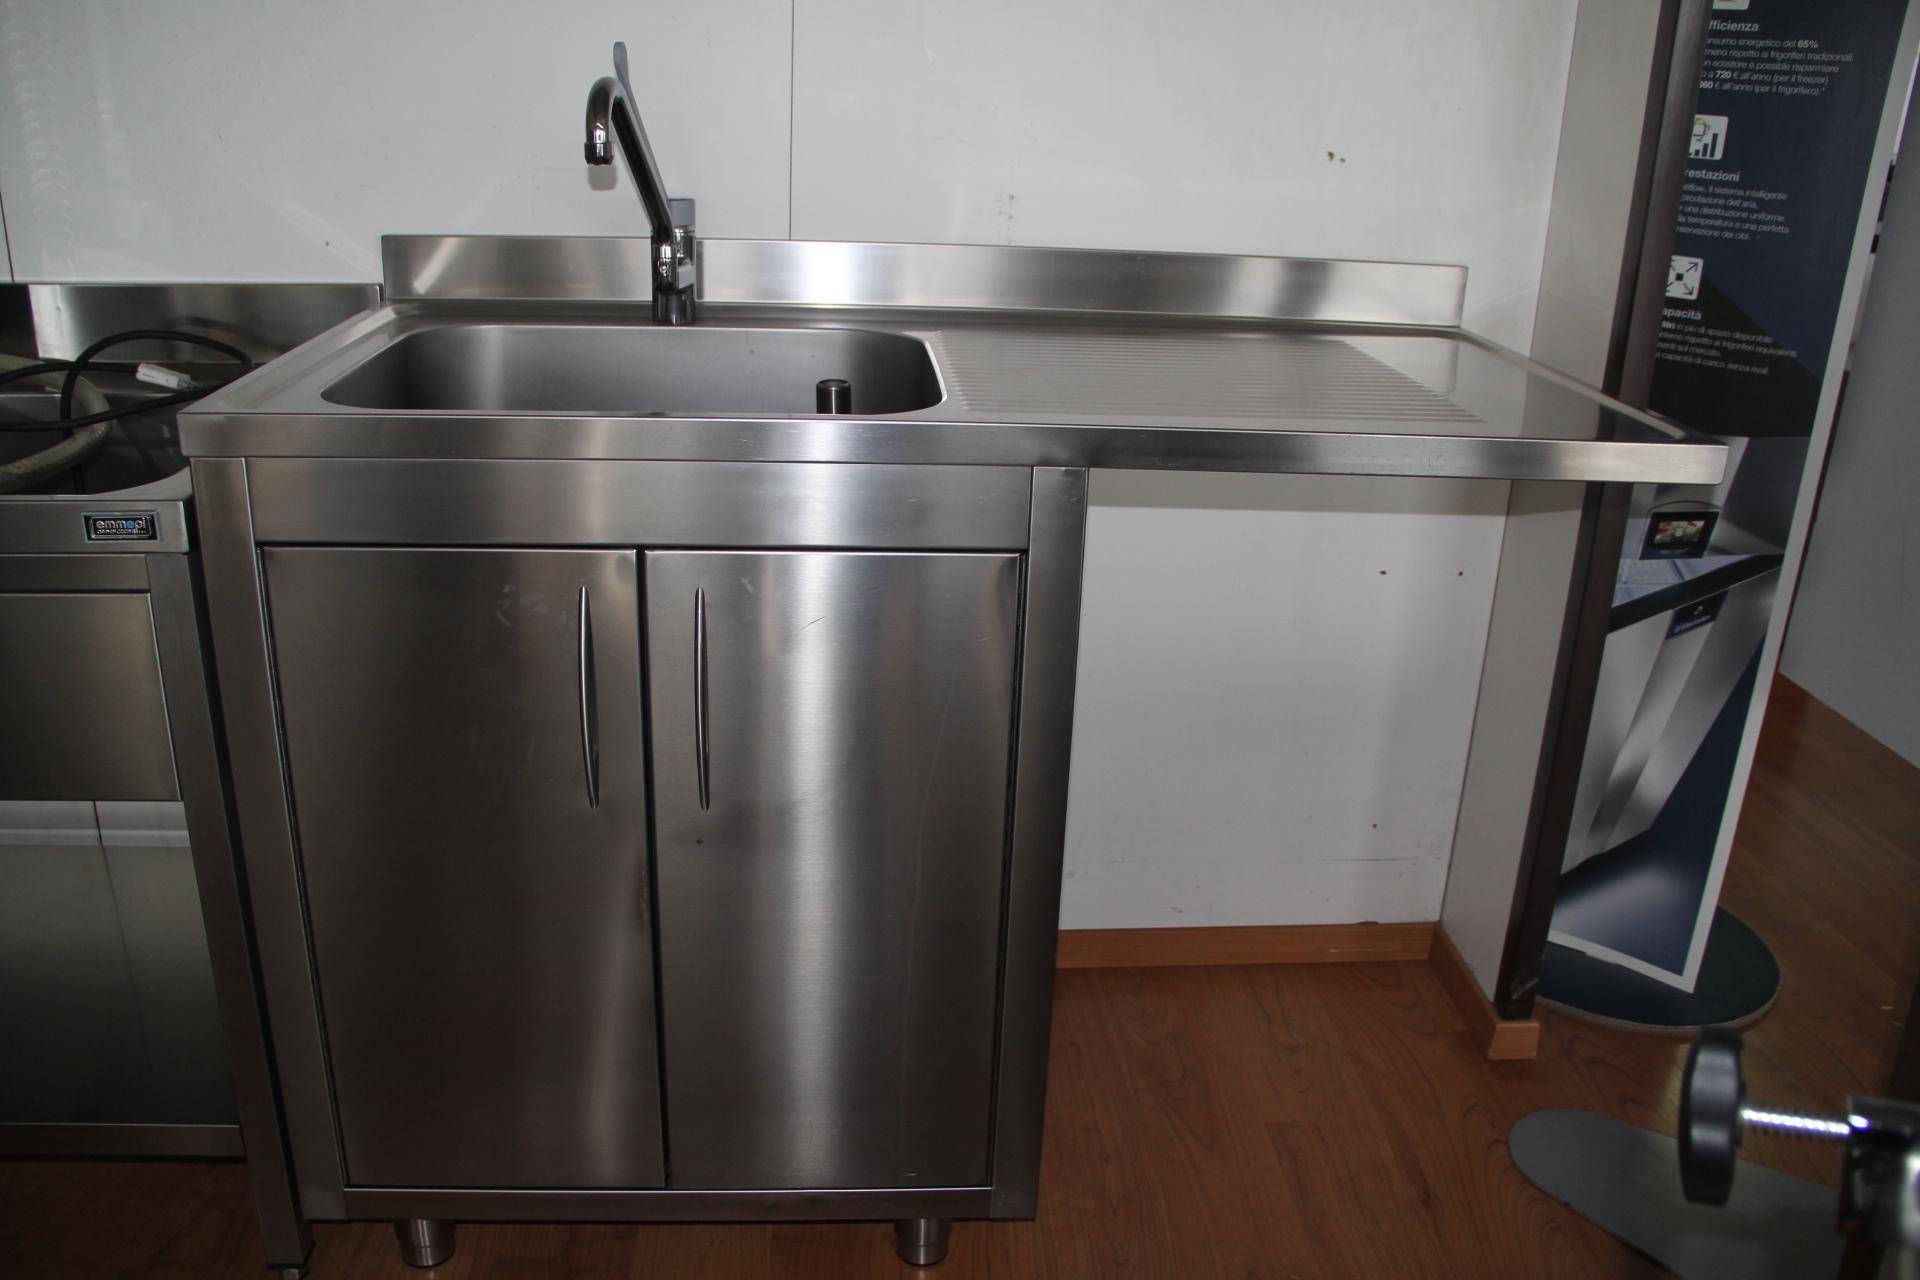 Lavandino Cucina Con Gocciolatoio lavello 1 vasca con gocciolatoio